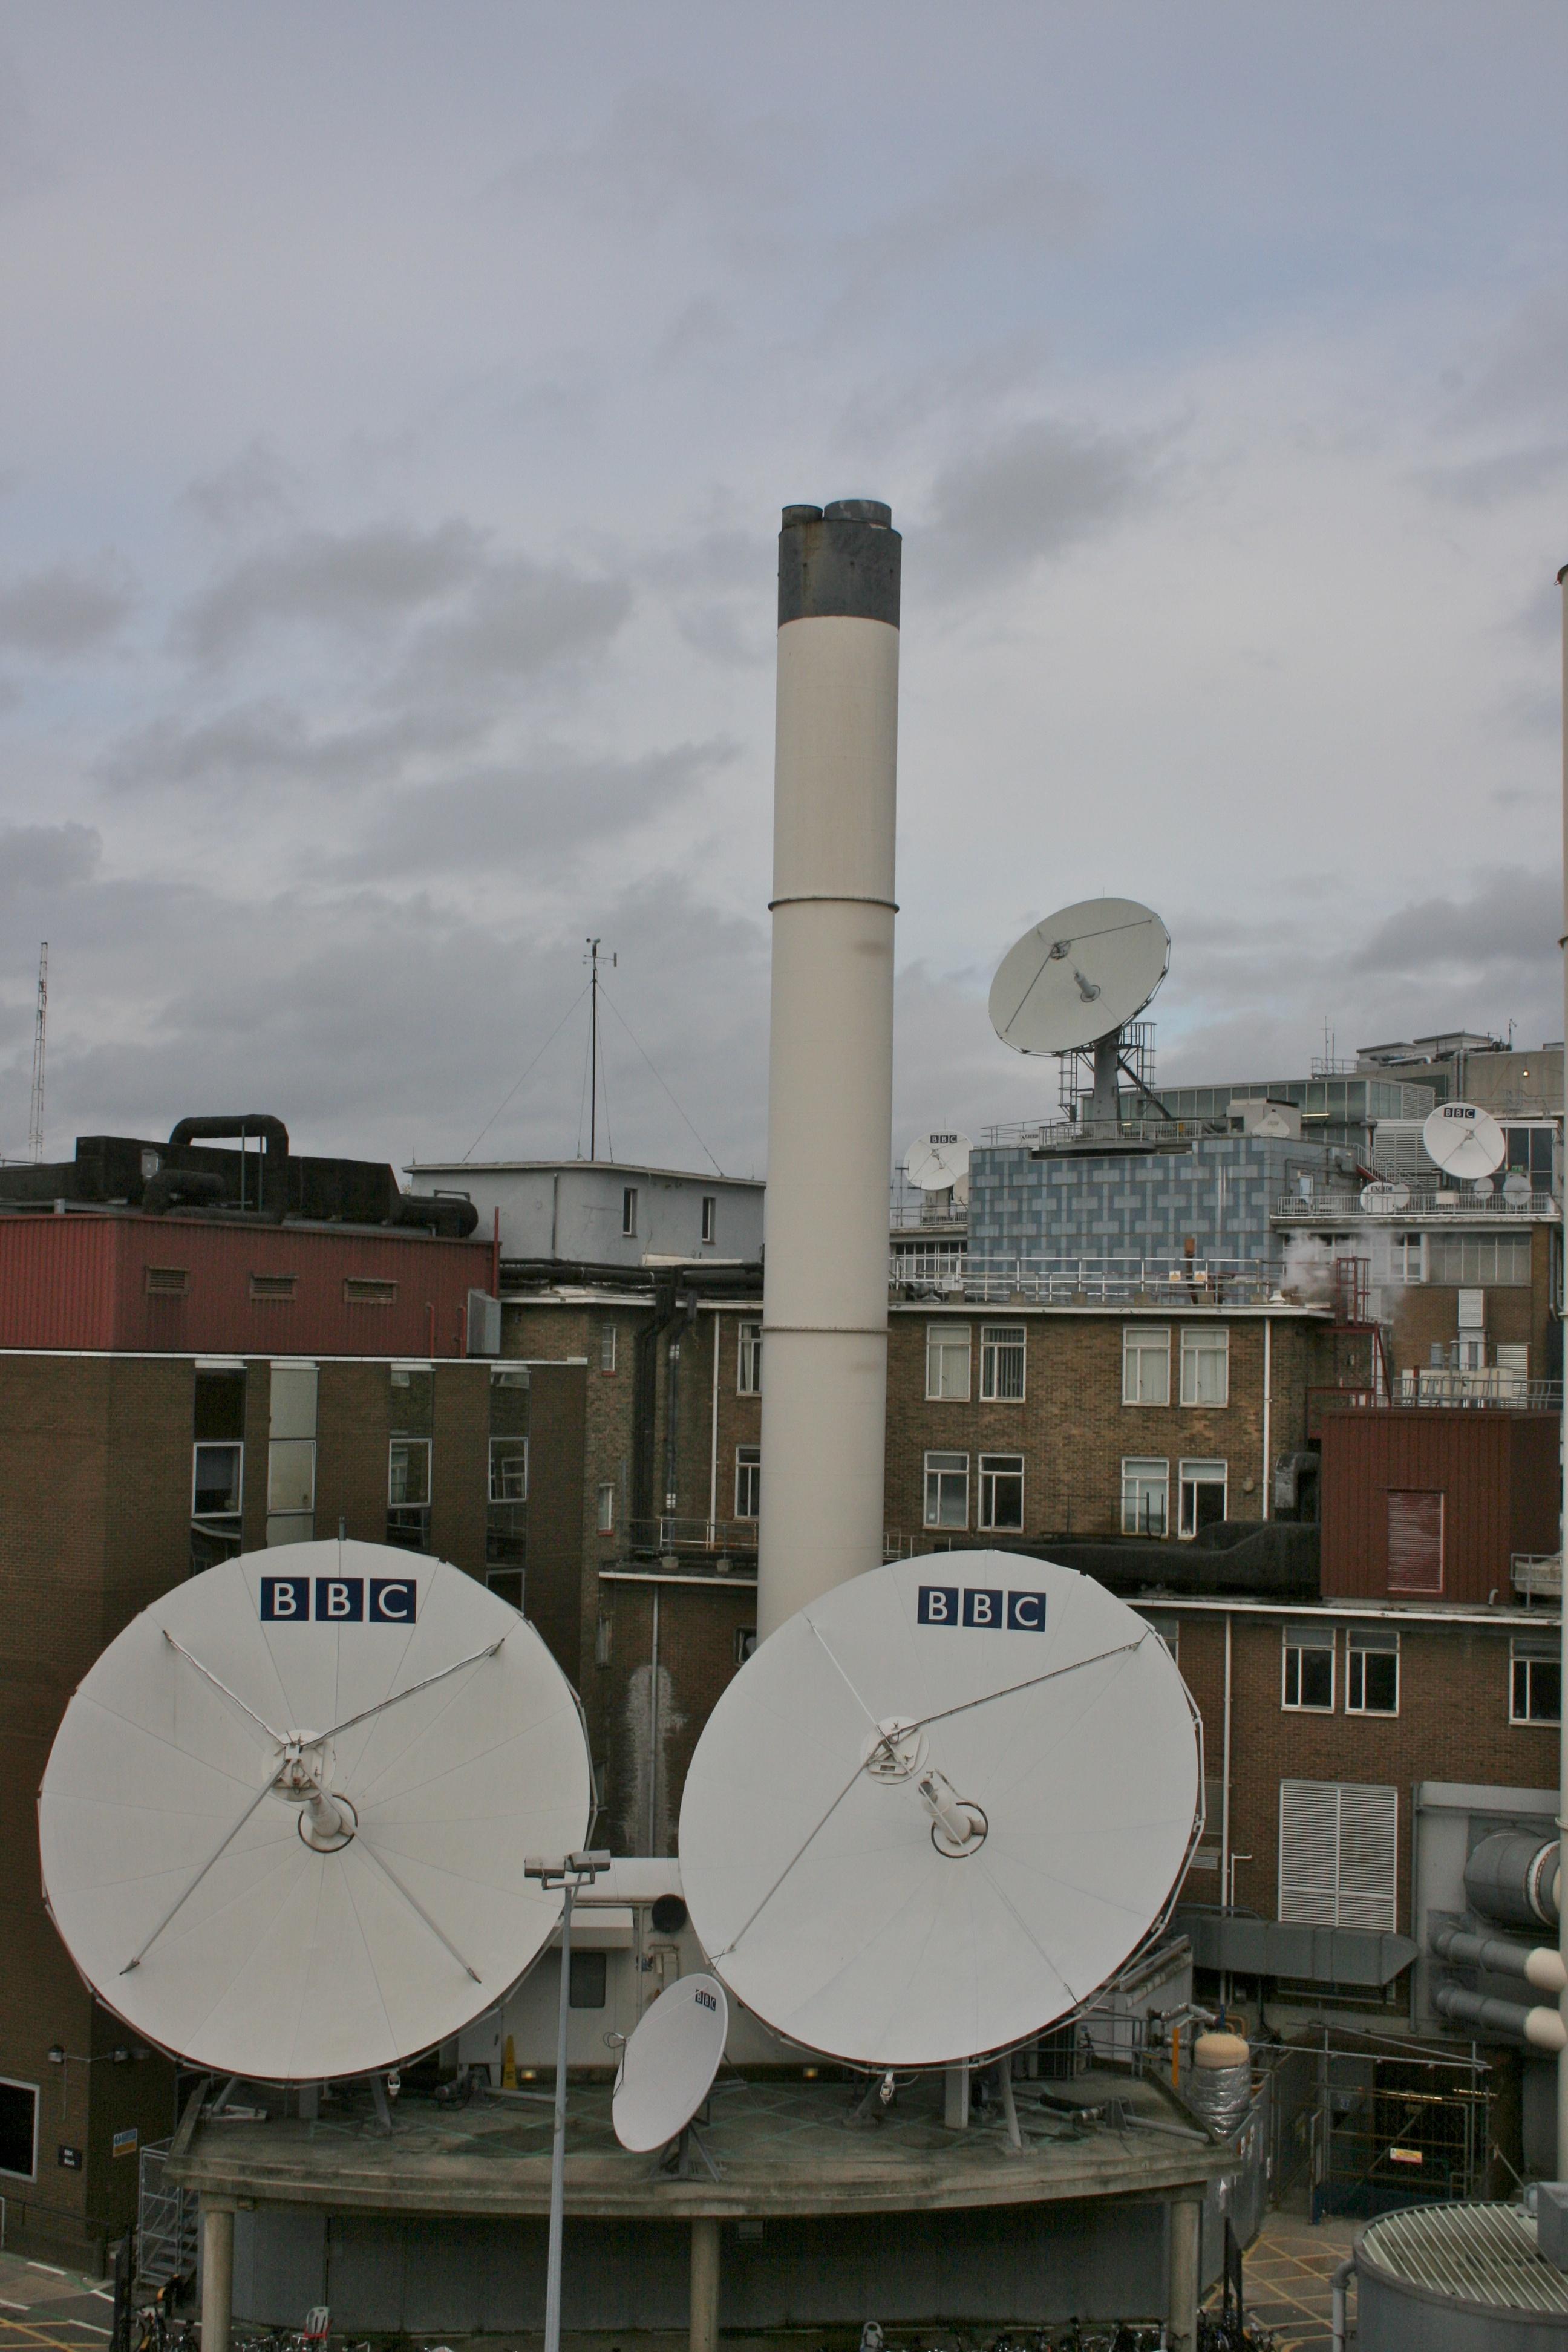 FileBBC Television Centre Satellite Dishes 2